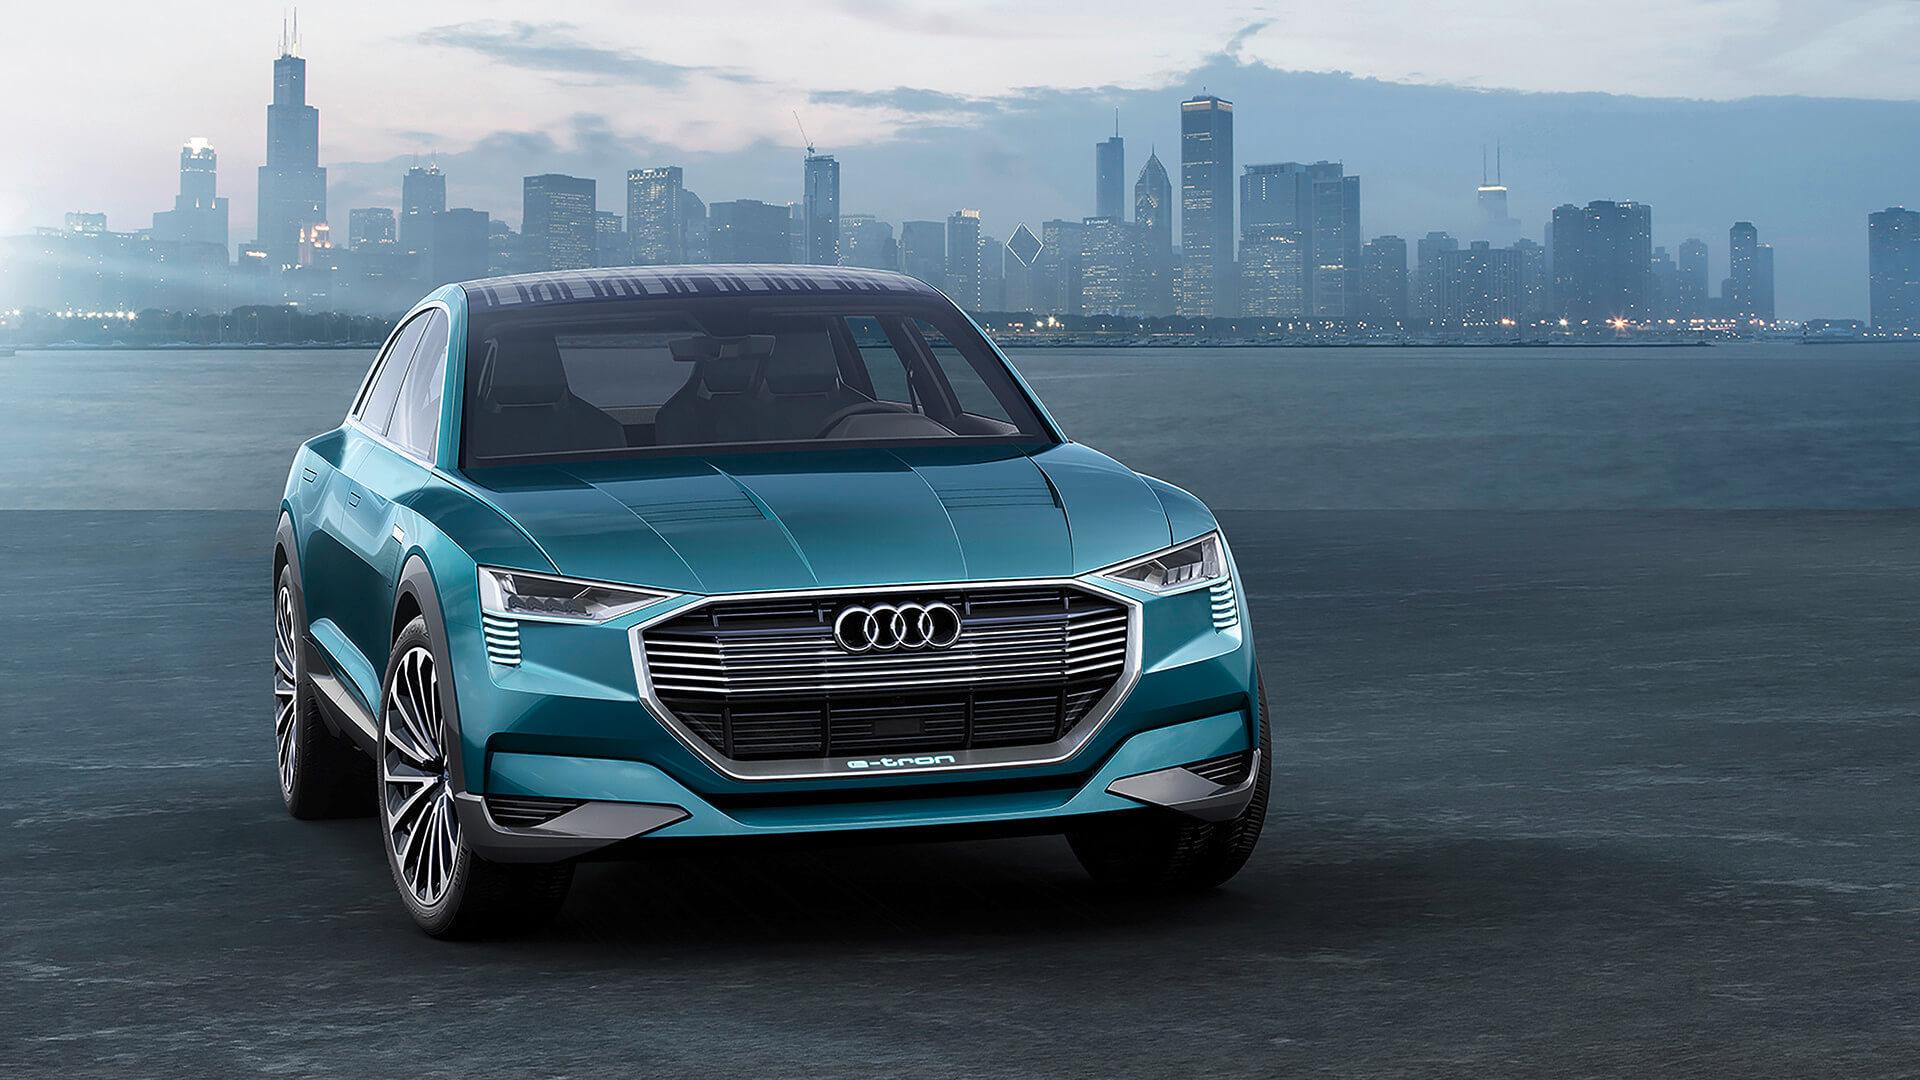 Концепция автомобиля Audi e-tron quattro